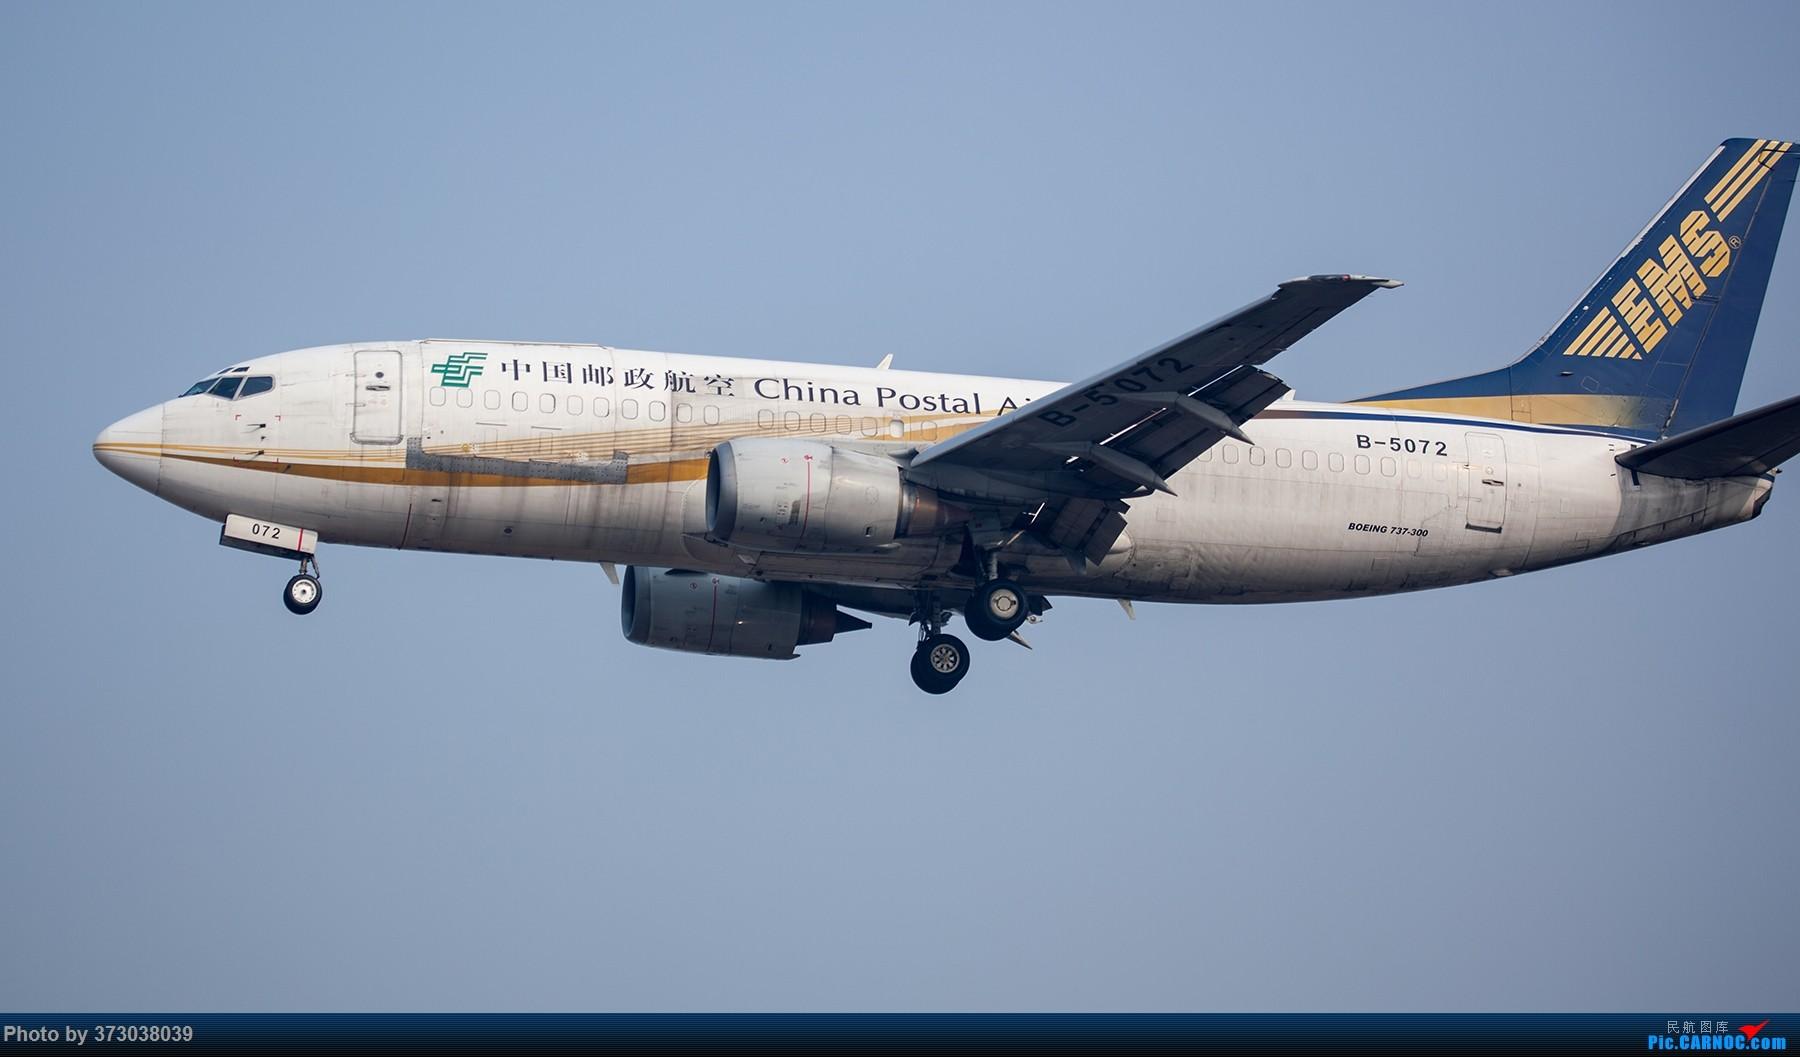 Re:[原创]【杭州飞友会】A320Neo迪士尼杭州萧山机场拍机班门弄斧记 BOEING 737-300 B-5072 中国杭州萧山国际机场